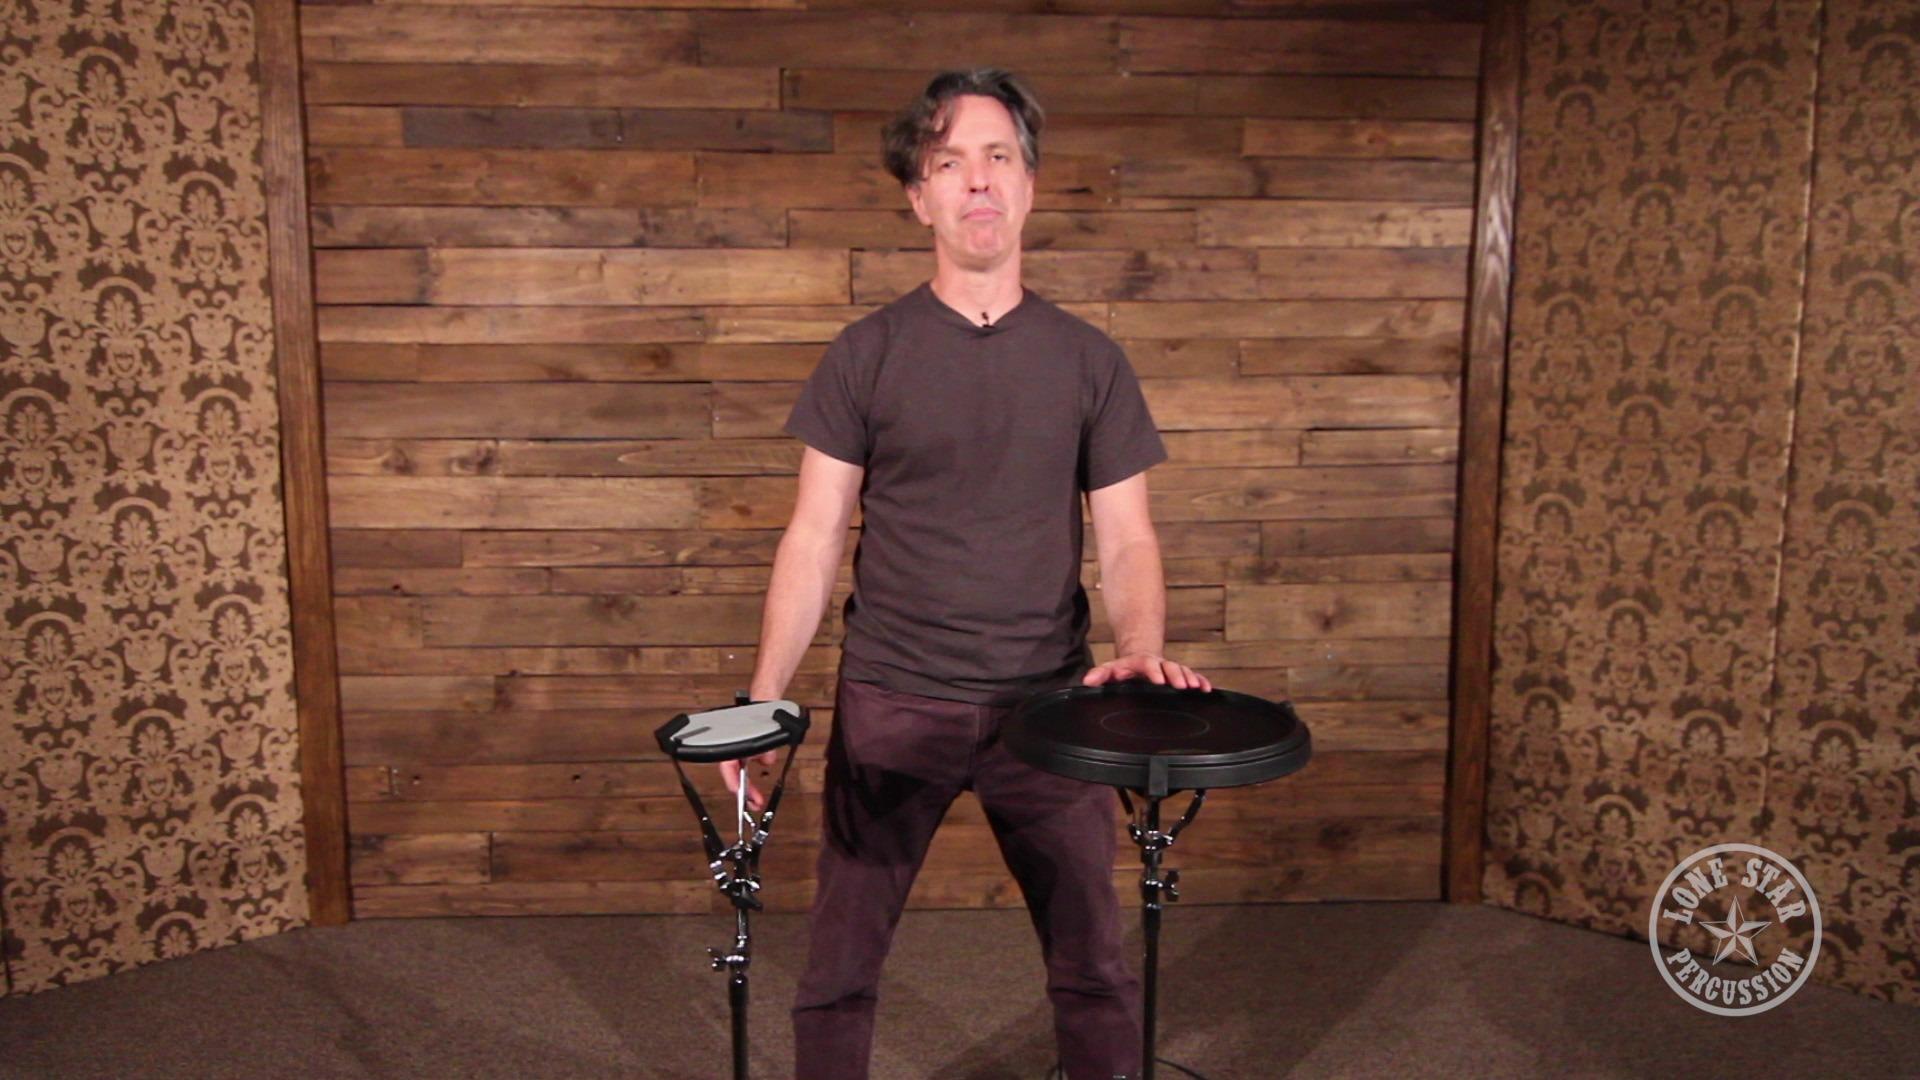 Ahead Asst2 Lightweight Concert Height Snare Practice Pad